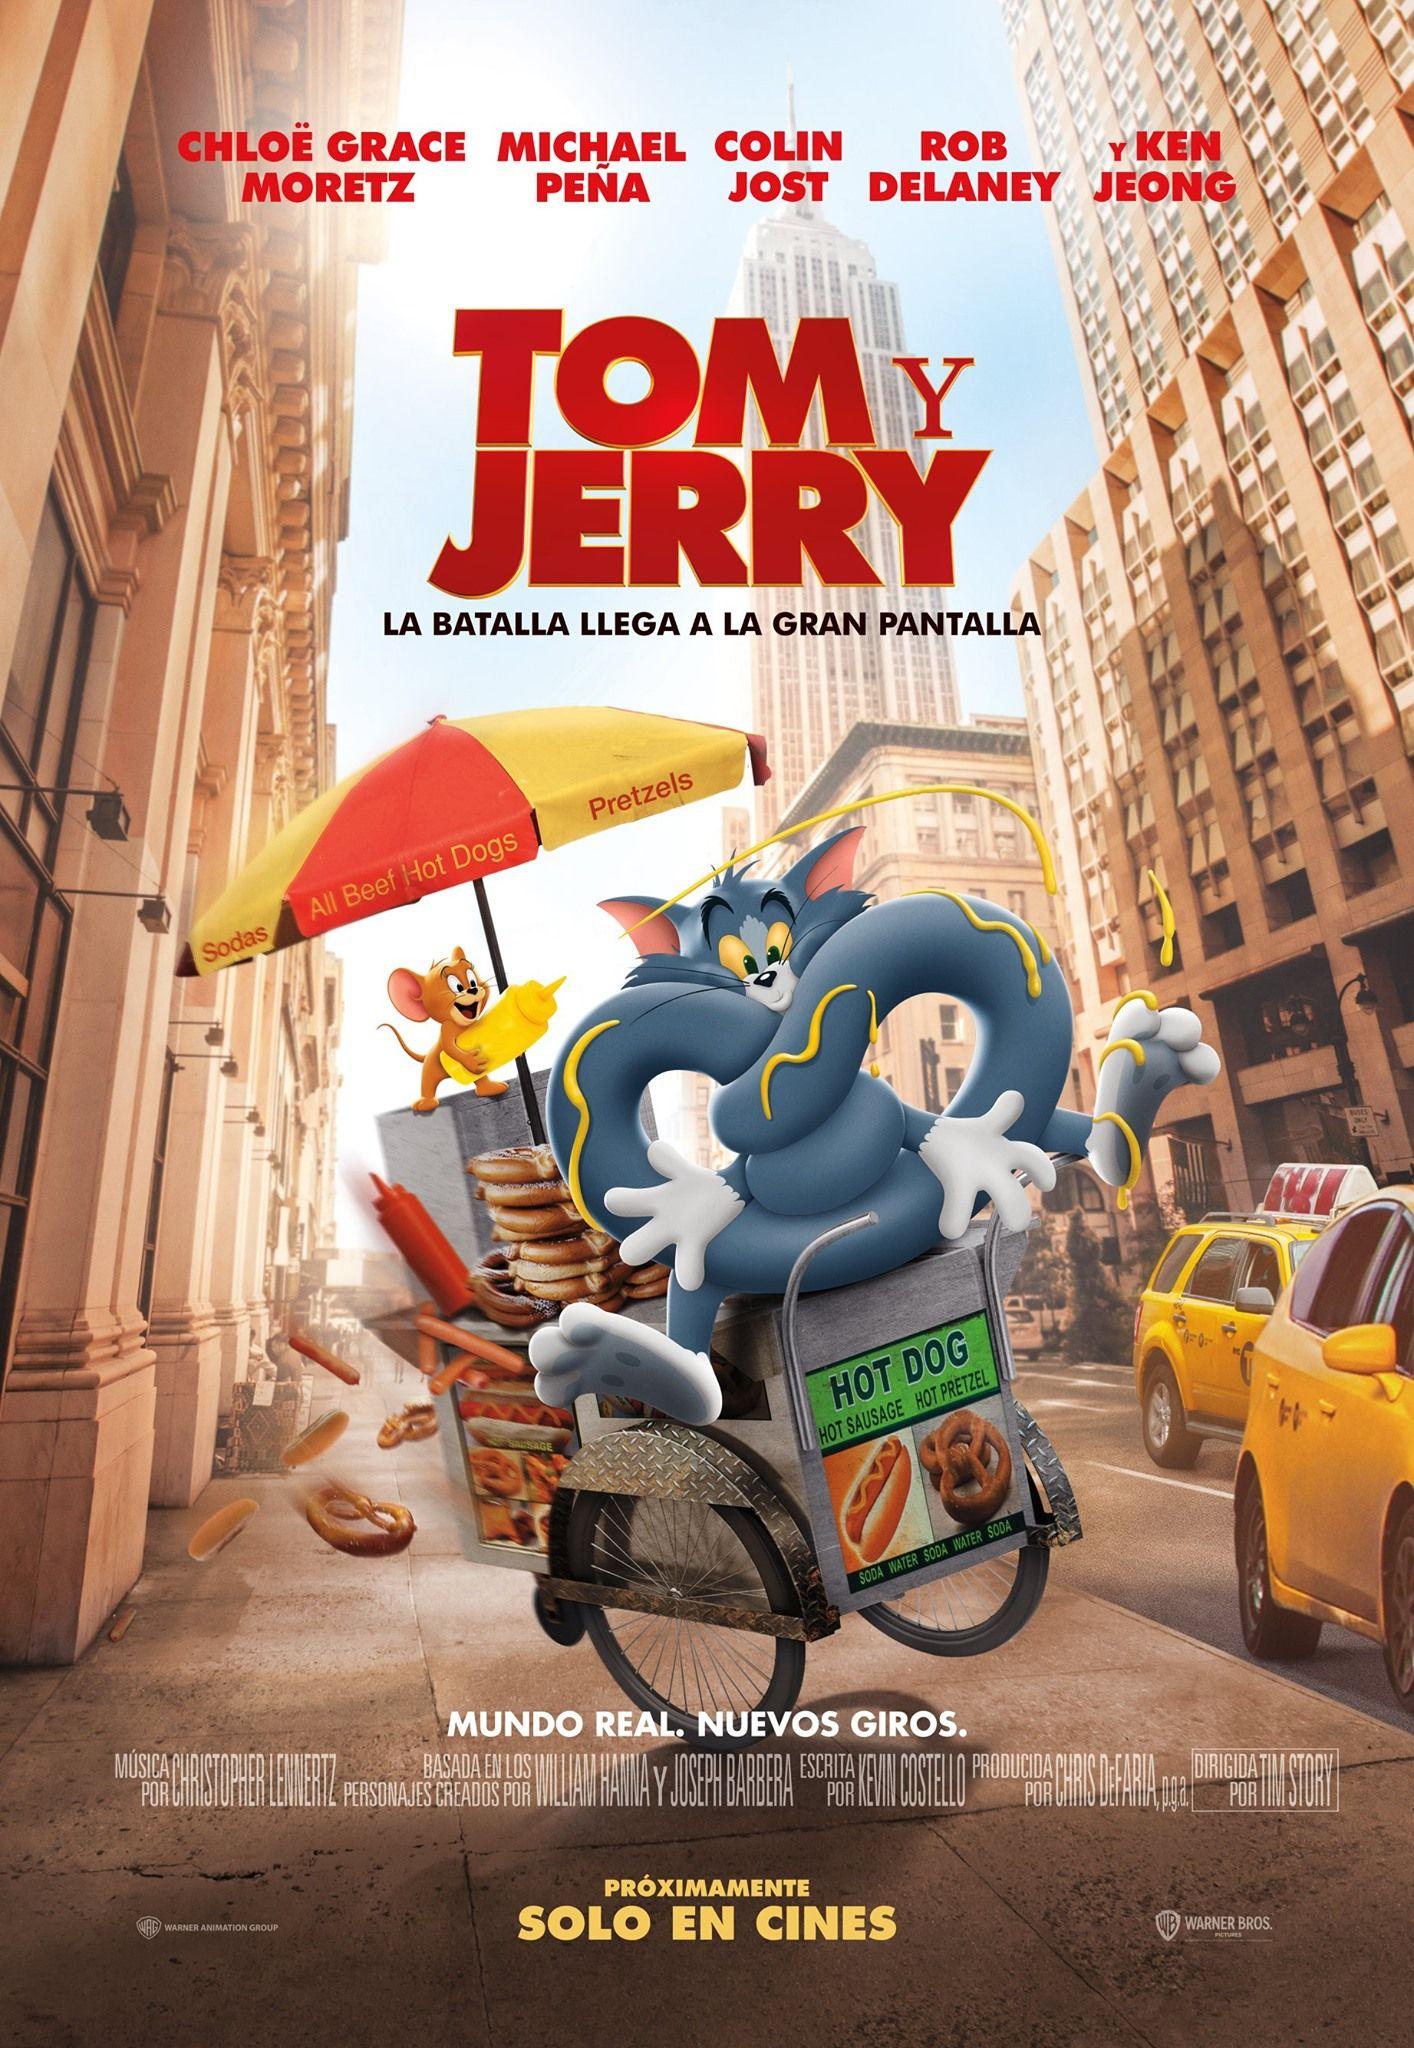 La Pelicula De Tom Y Jerry Anuncia Fecha Oficial De Estreno In 2021 Tom And Jerry Tom And Jerry Movies Tim Story